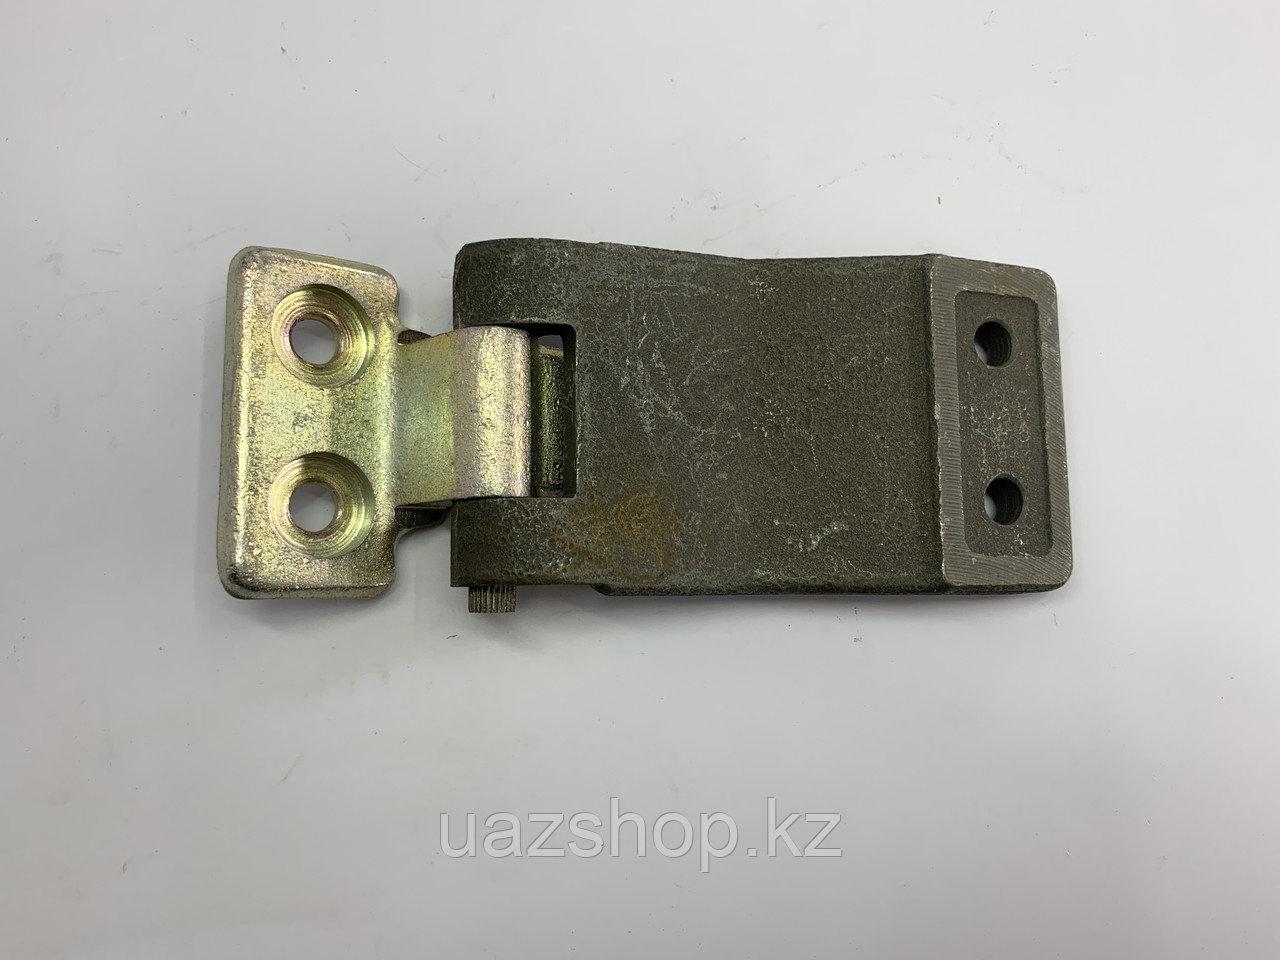 Петля двери задка УАЗ 452